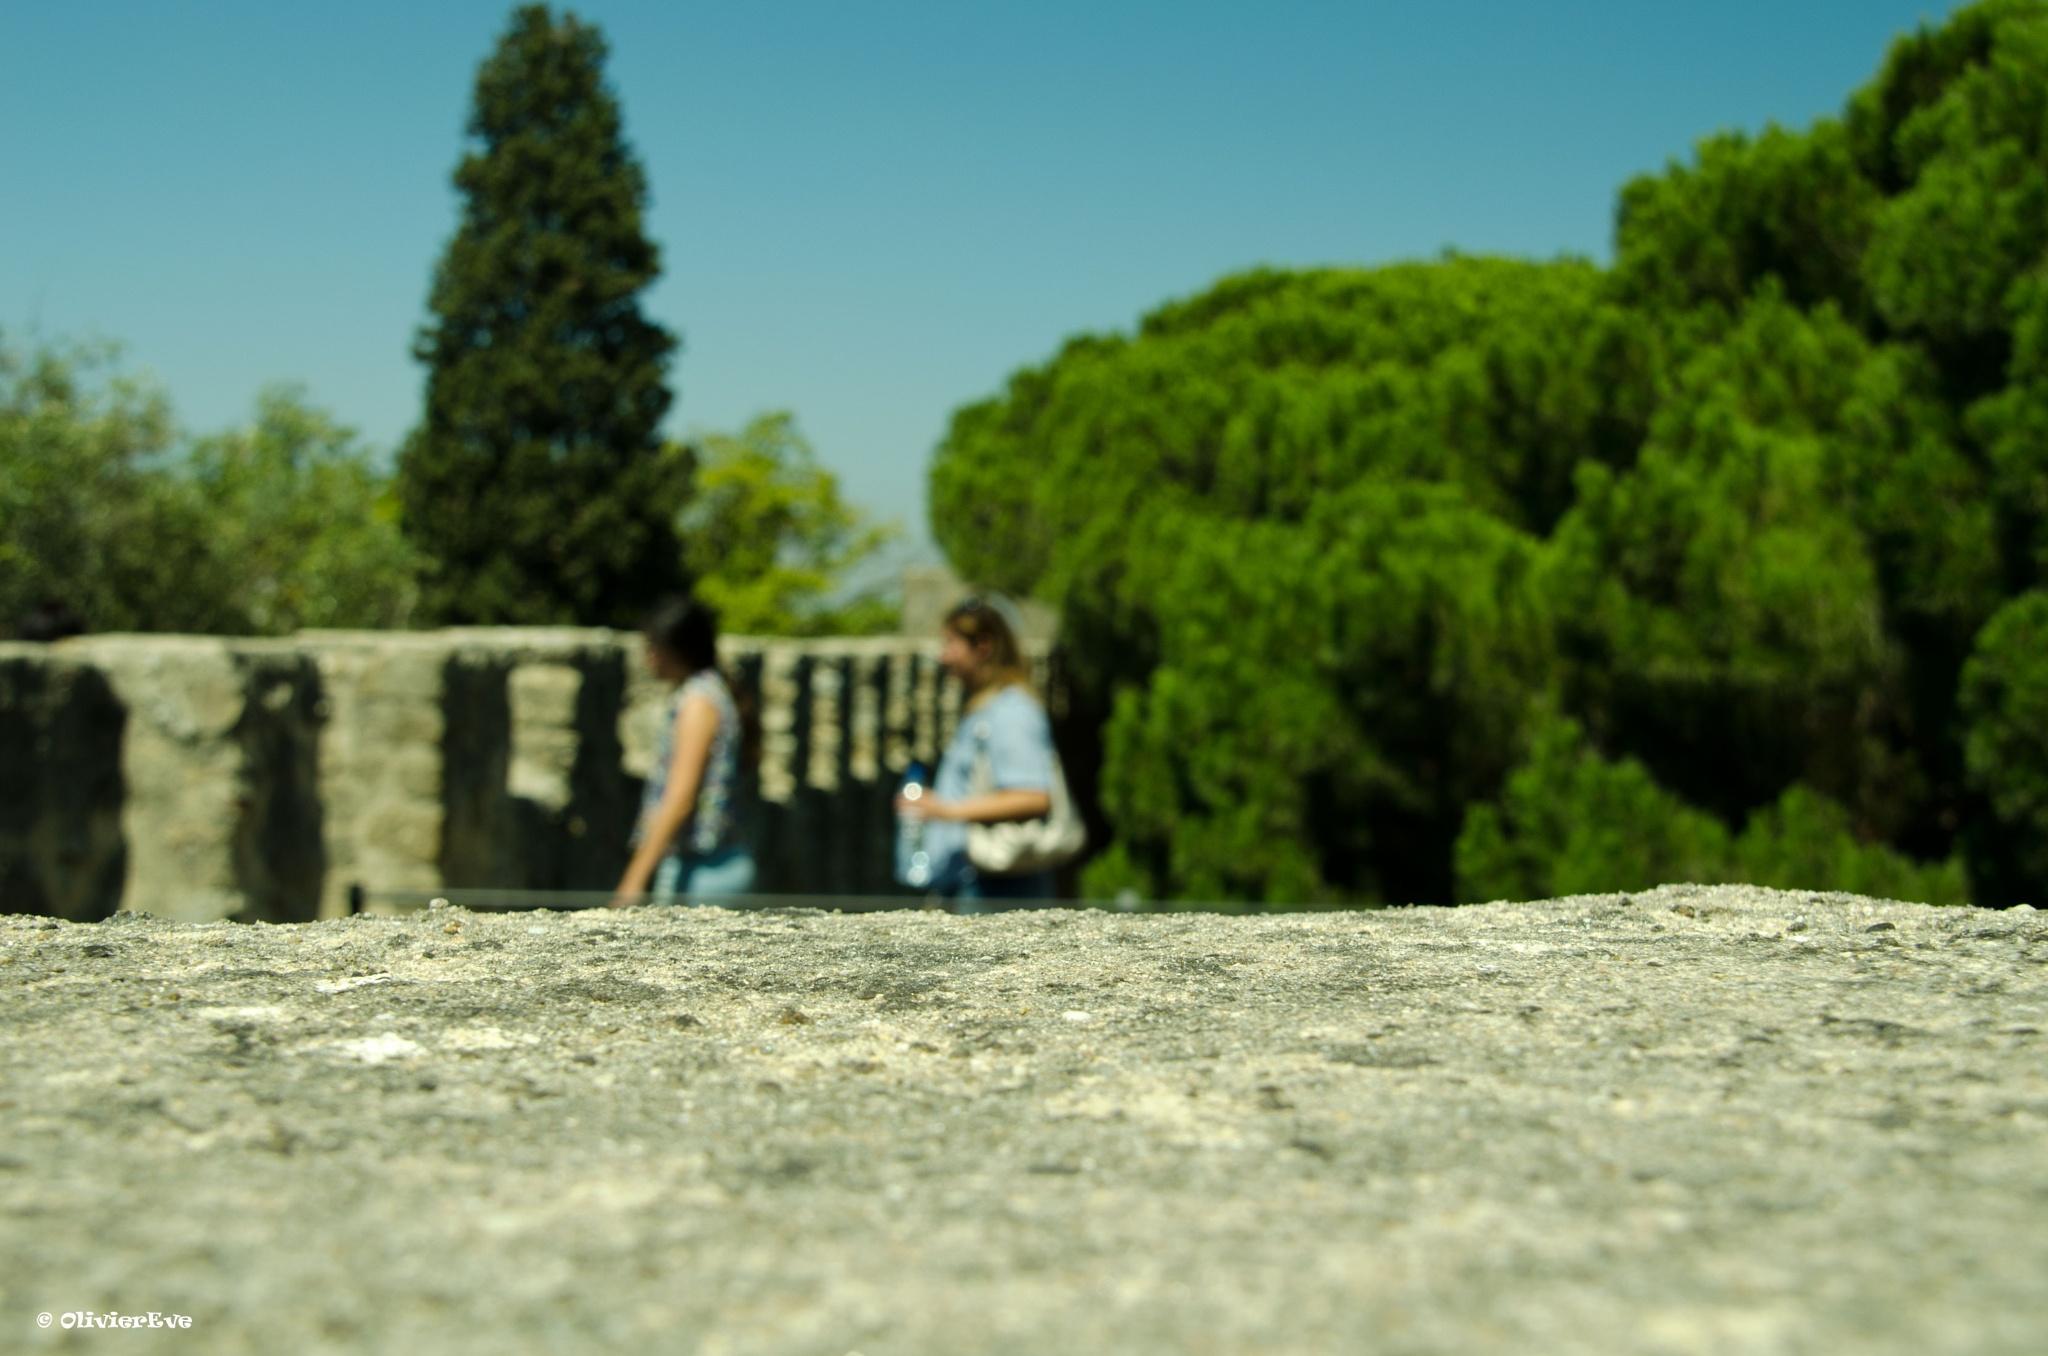 Les remparts by olivier evenisse